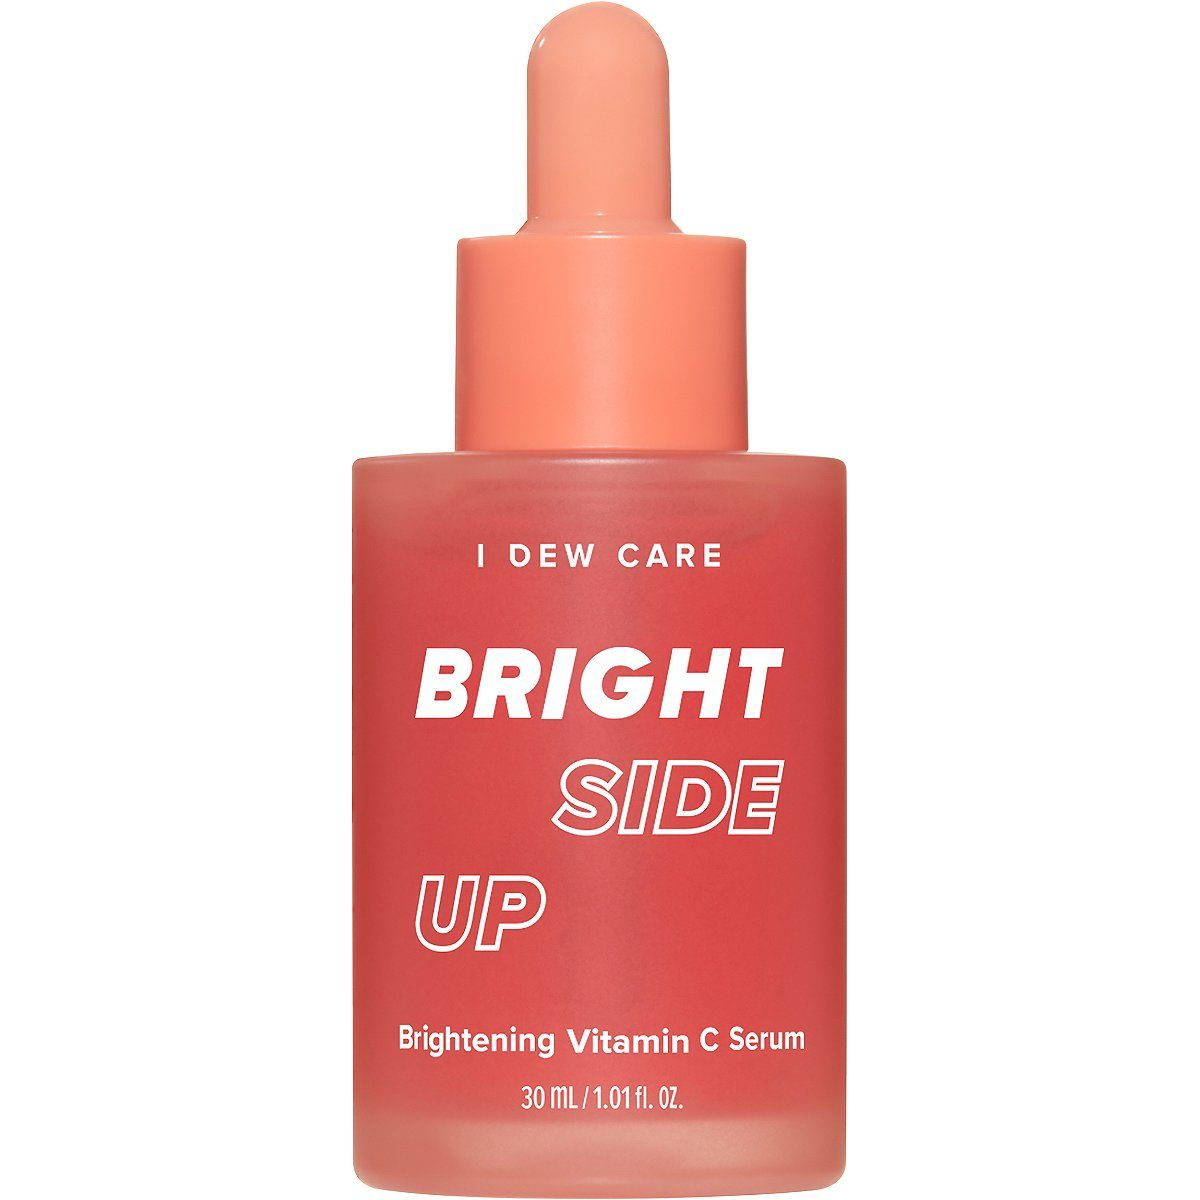 I Dew Care Bright Side Up Brightening Vitamin C Serum | Ulta Beauty